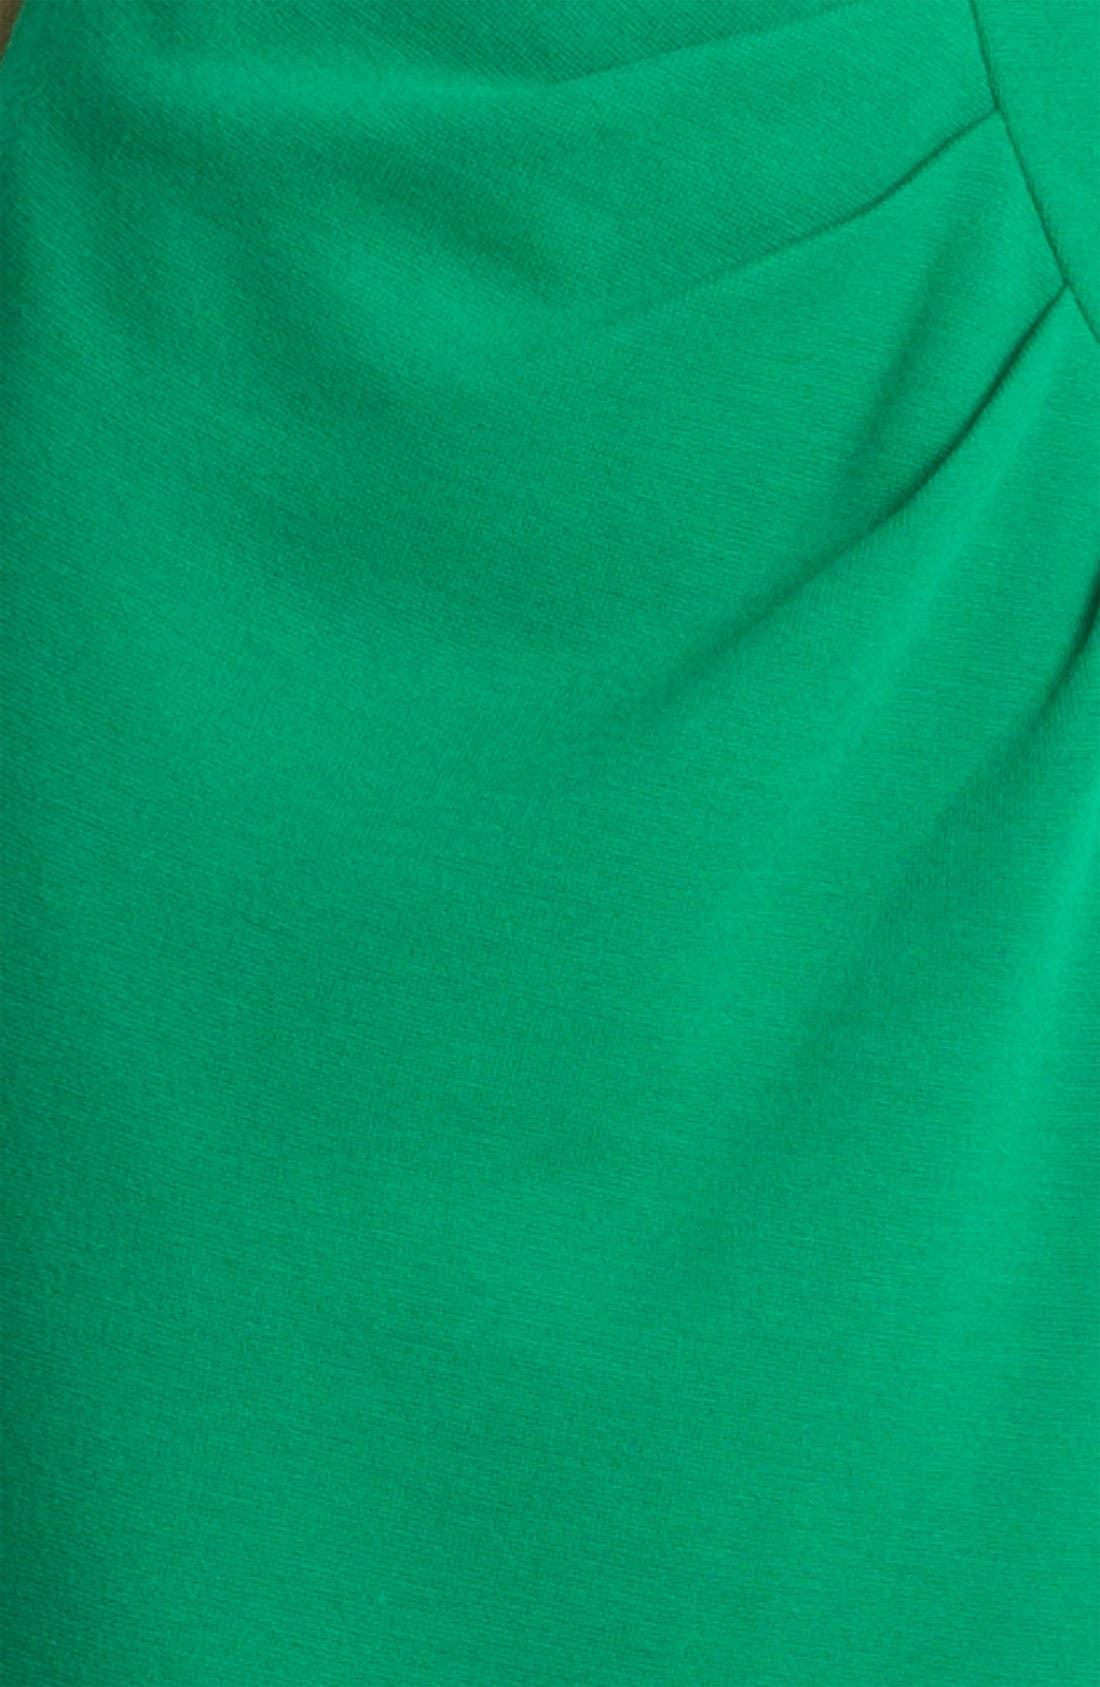 Alternate Image 3  - Milly 'Tucked' Sheath Dress